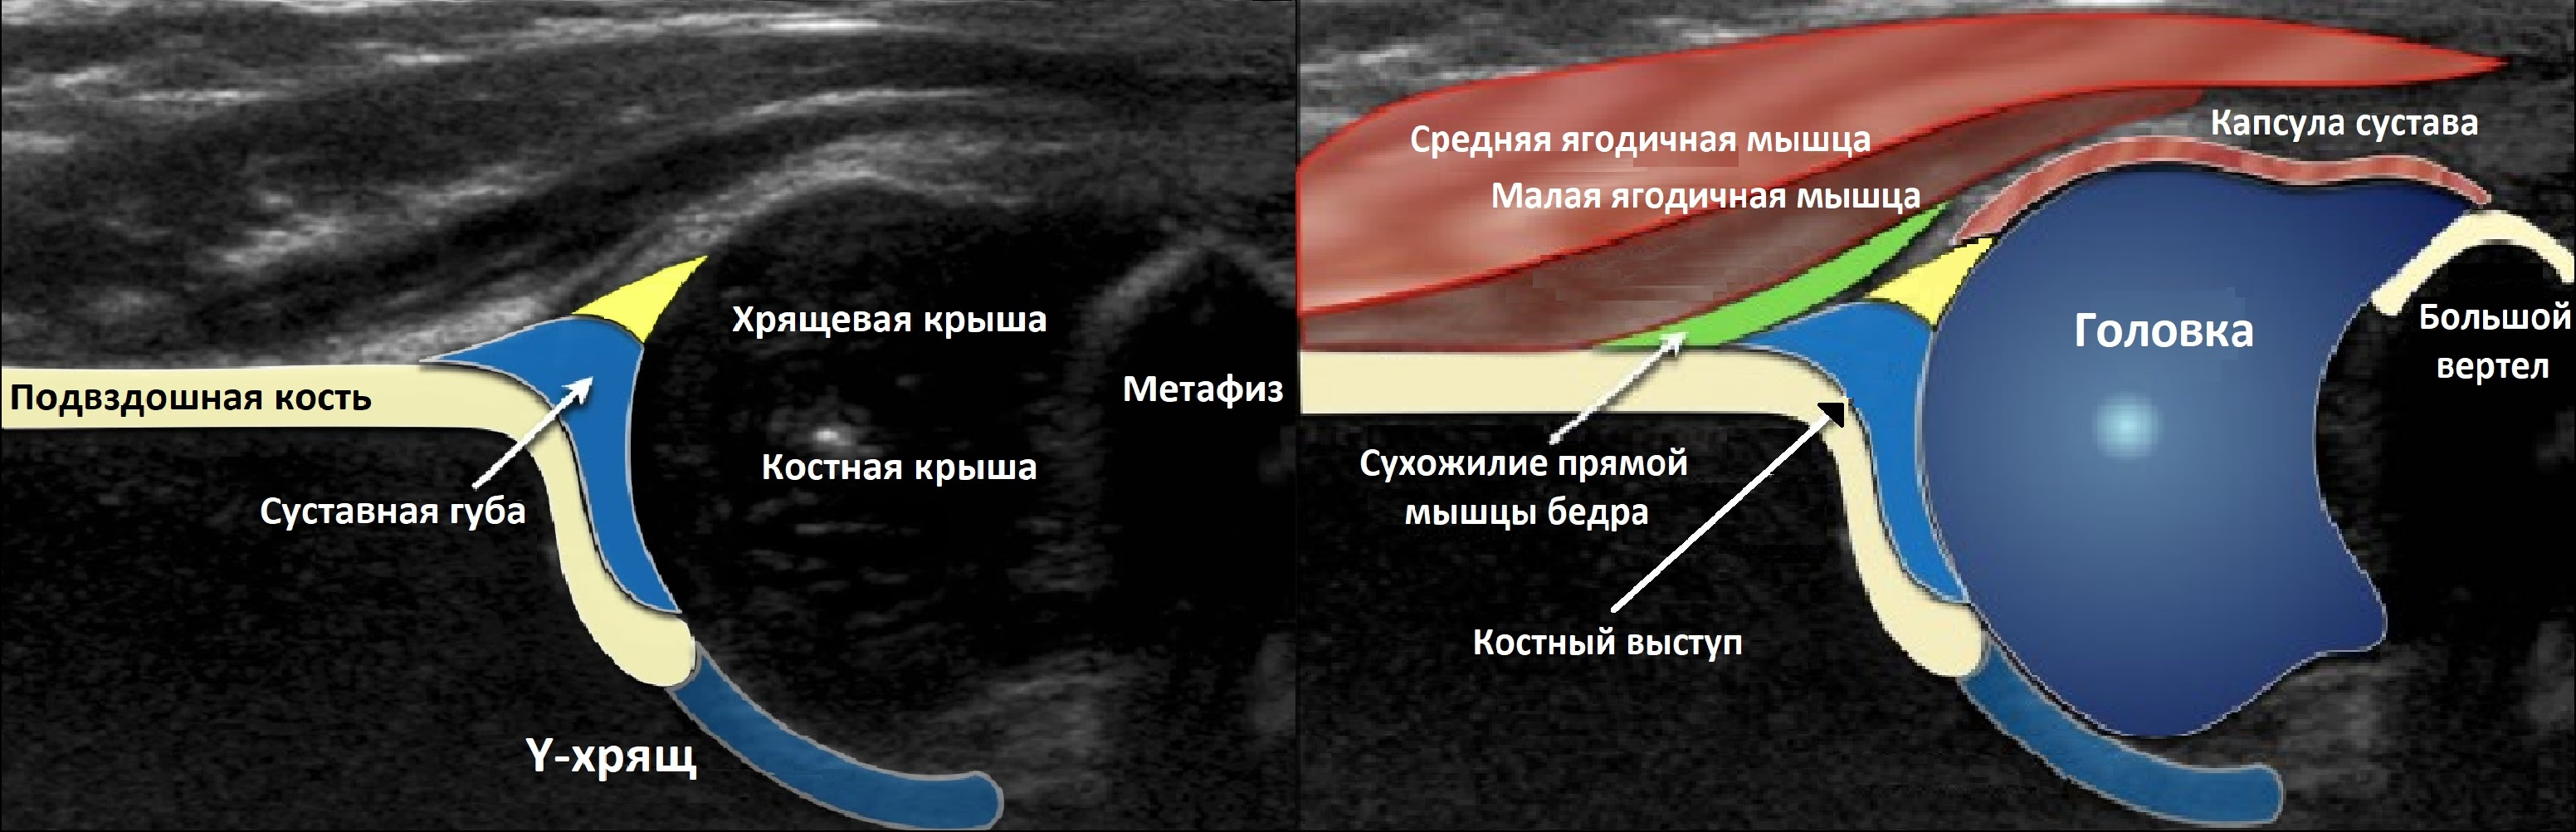 Изображение - Узд тазобедренного сустава у детей презентация Tbs-7